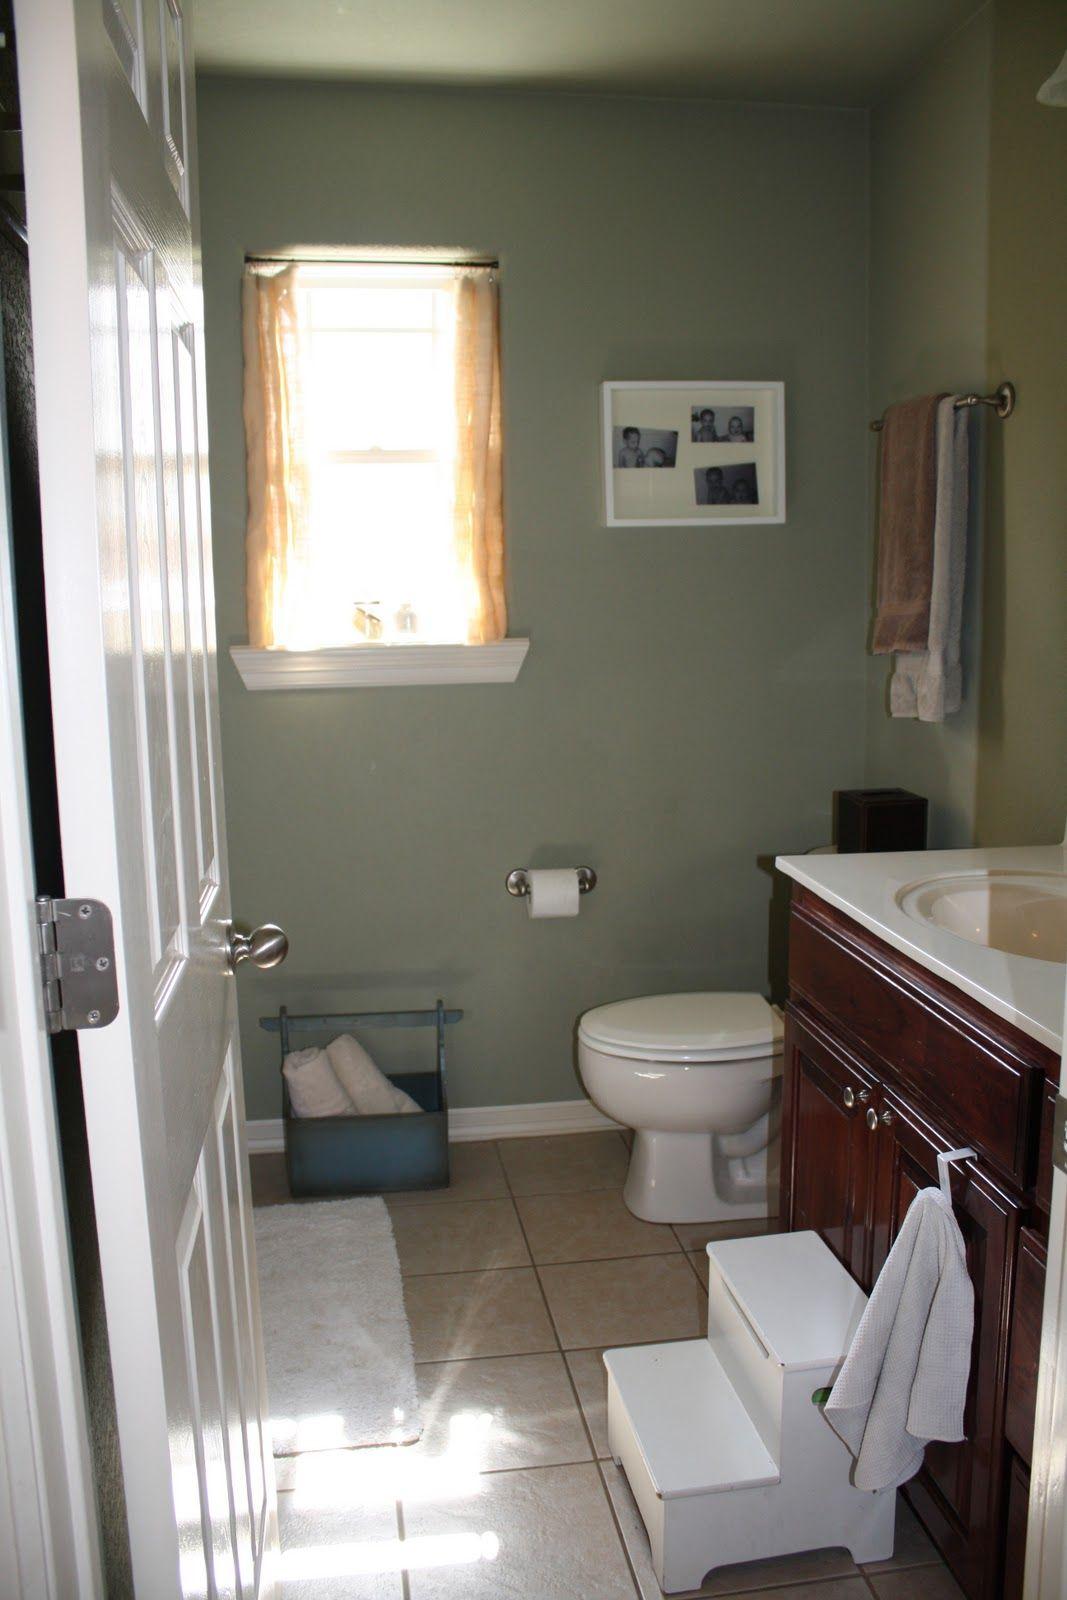 Sage Walls Bathroom Wall Colors Sage Green Walls White Bathroom Colors